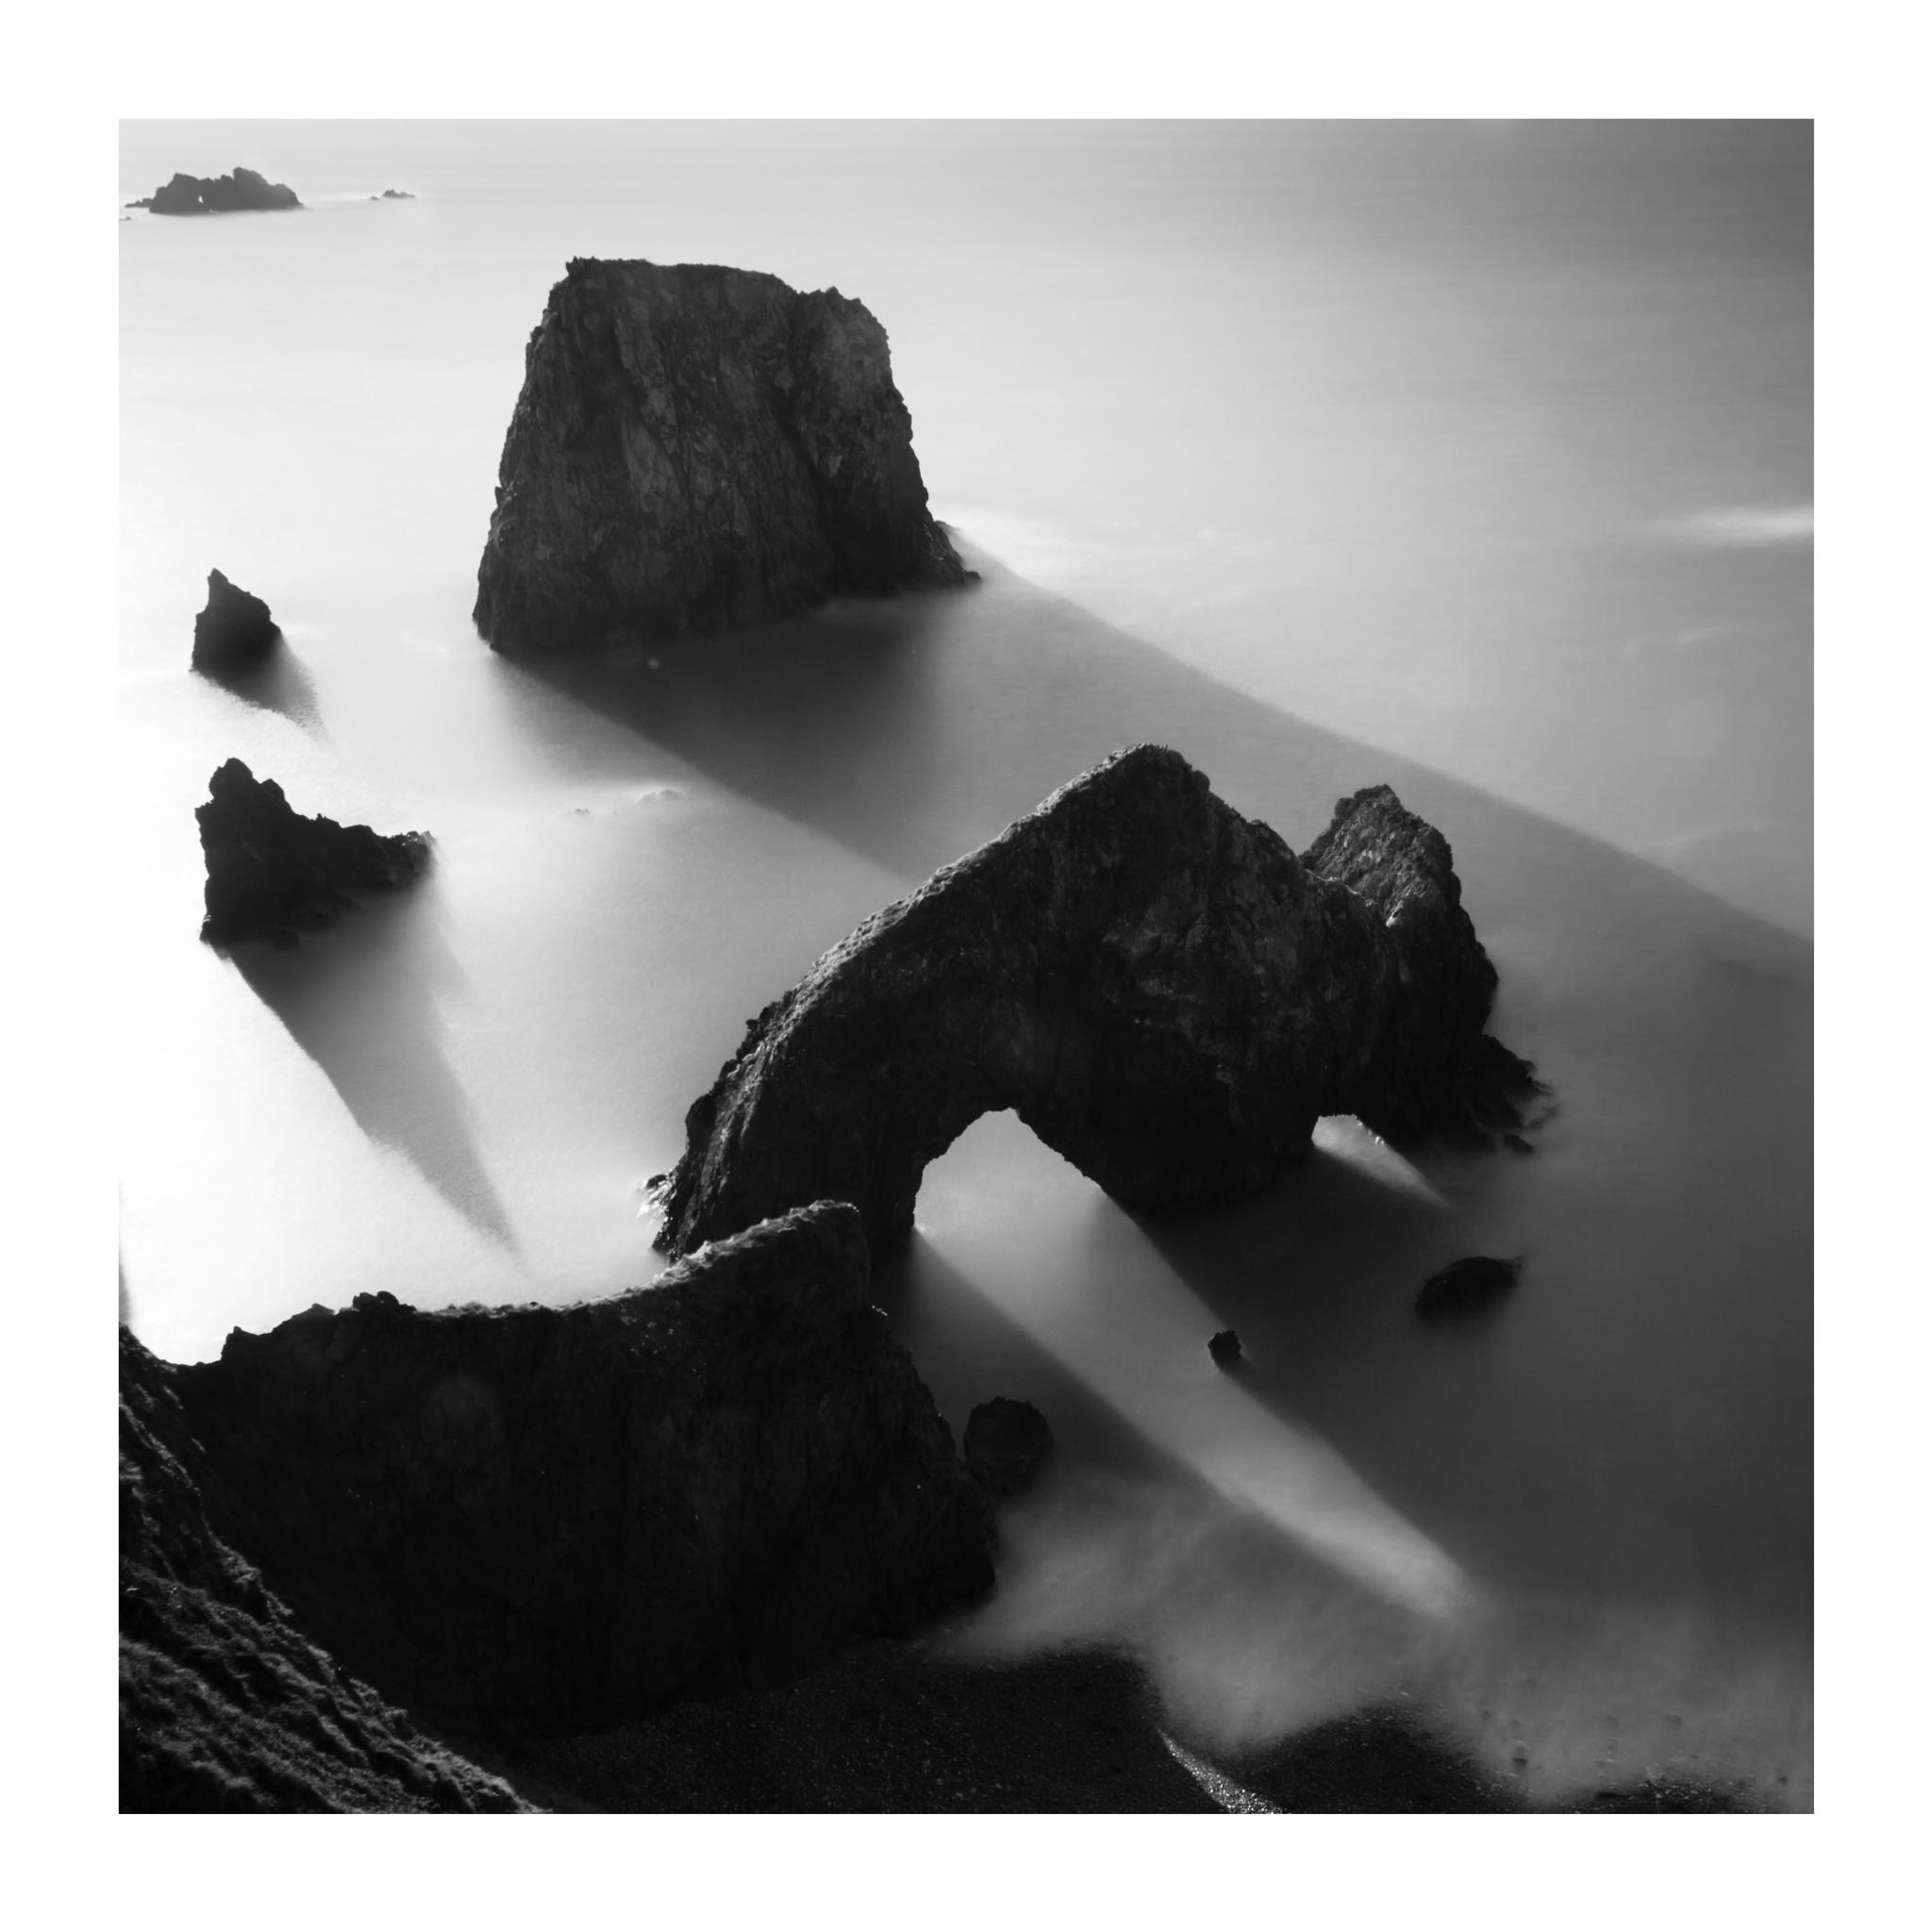 Copper Coast 24 - Kilfarrasy Beach fro mthe cliff tops at dawn